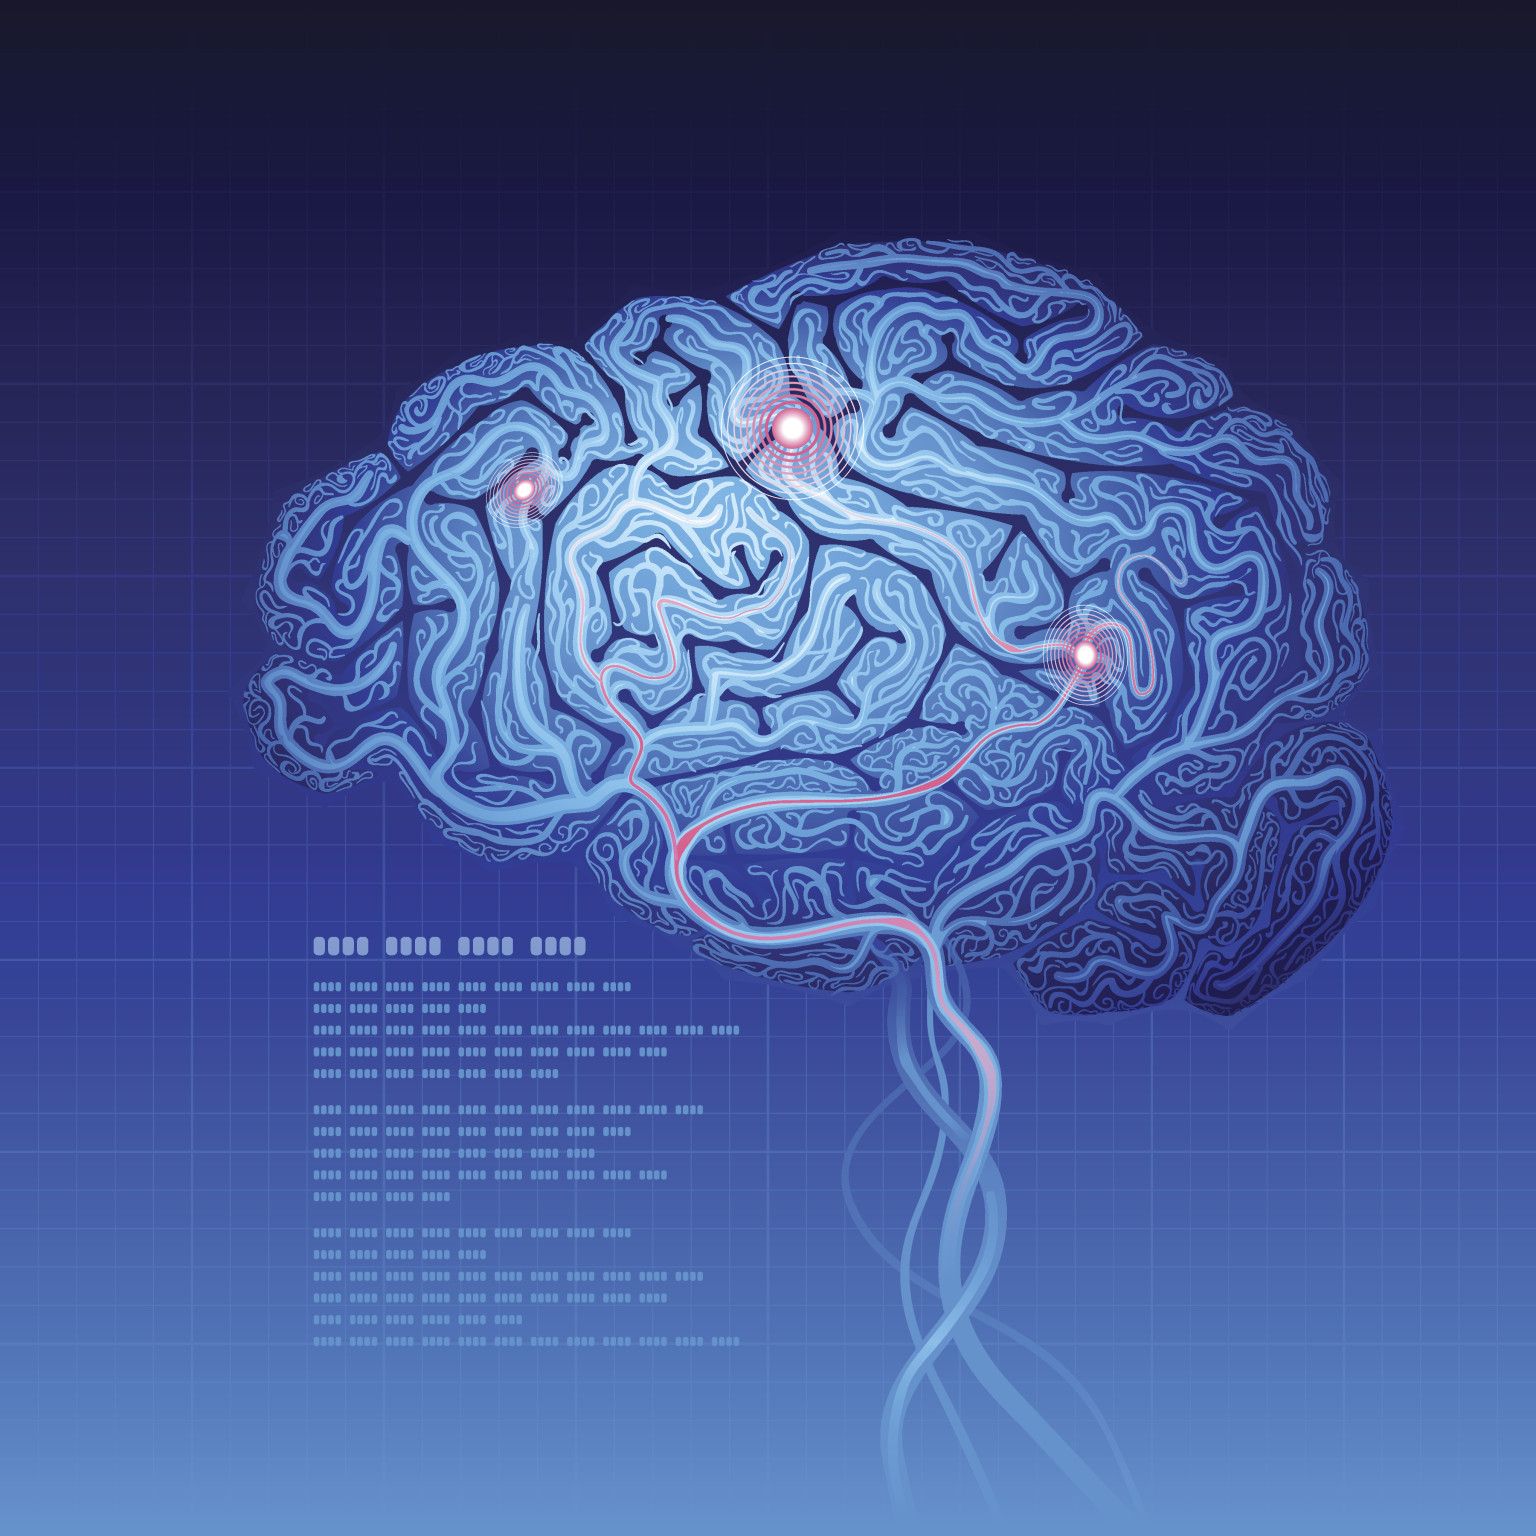 3D Brain Map: New 'BigBrain' Atlas Called Most Detailed